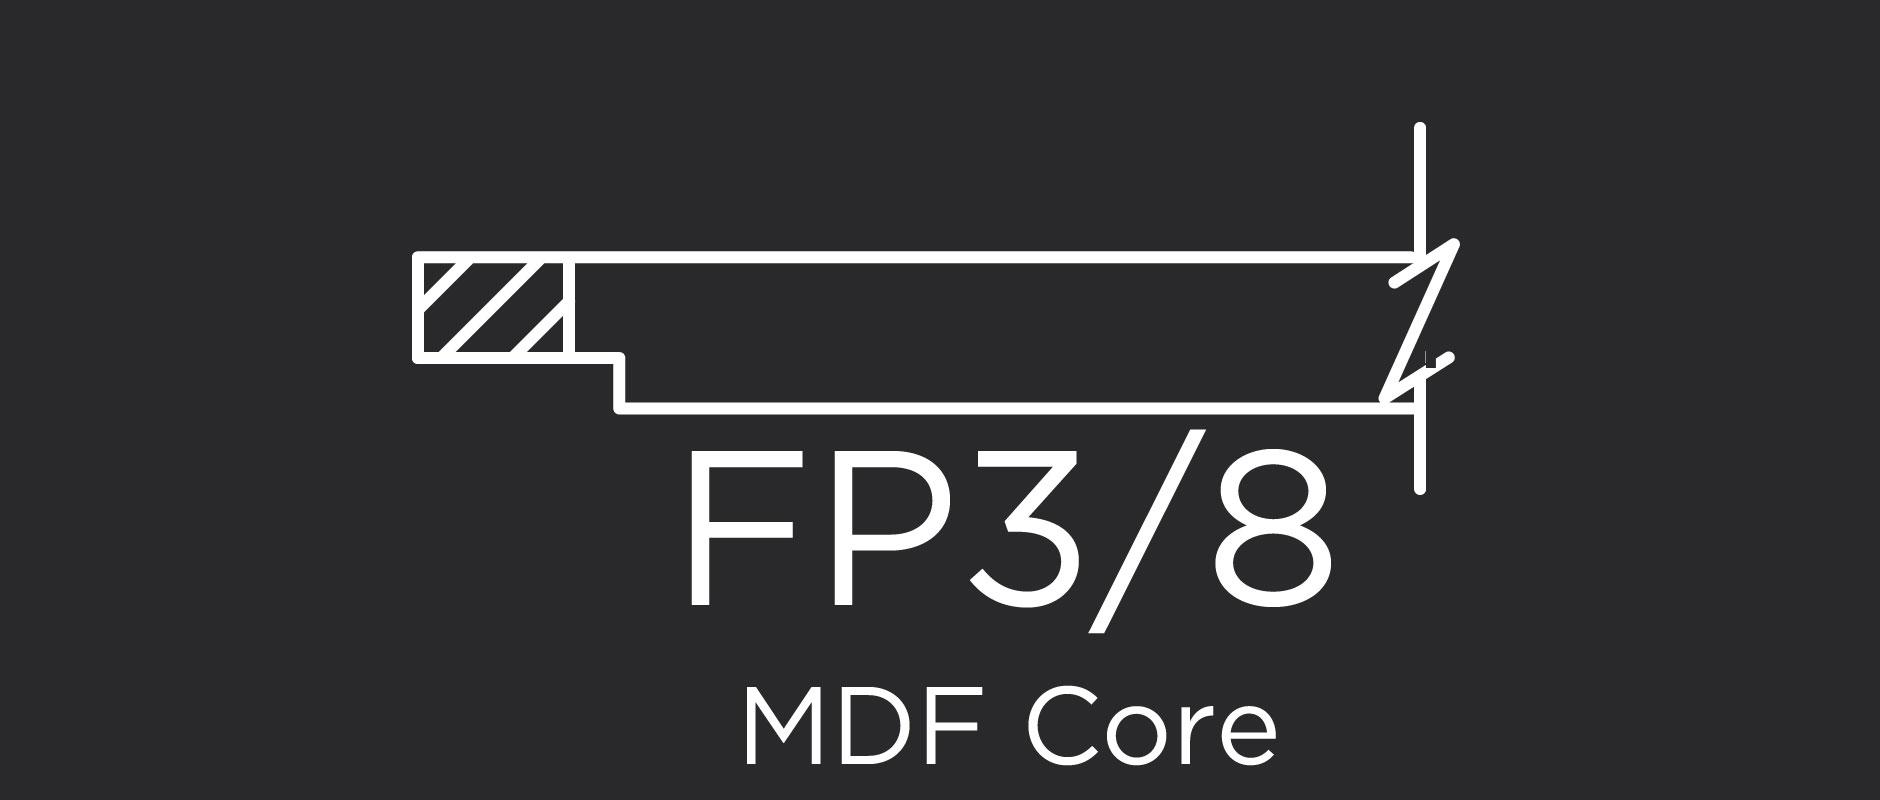 FP3/8 MDF core flat panel